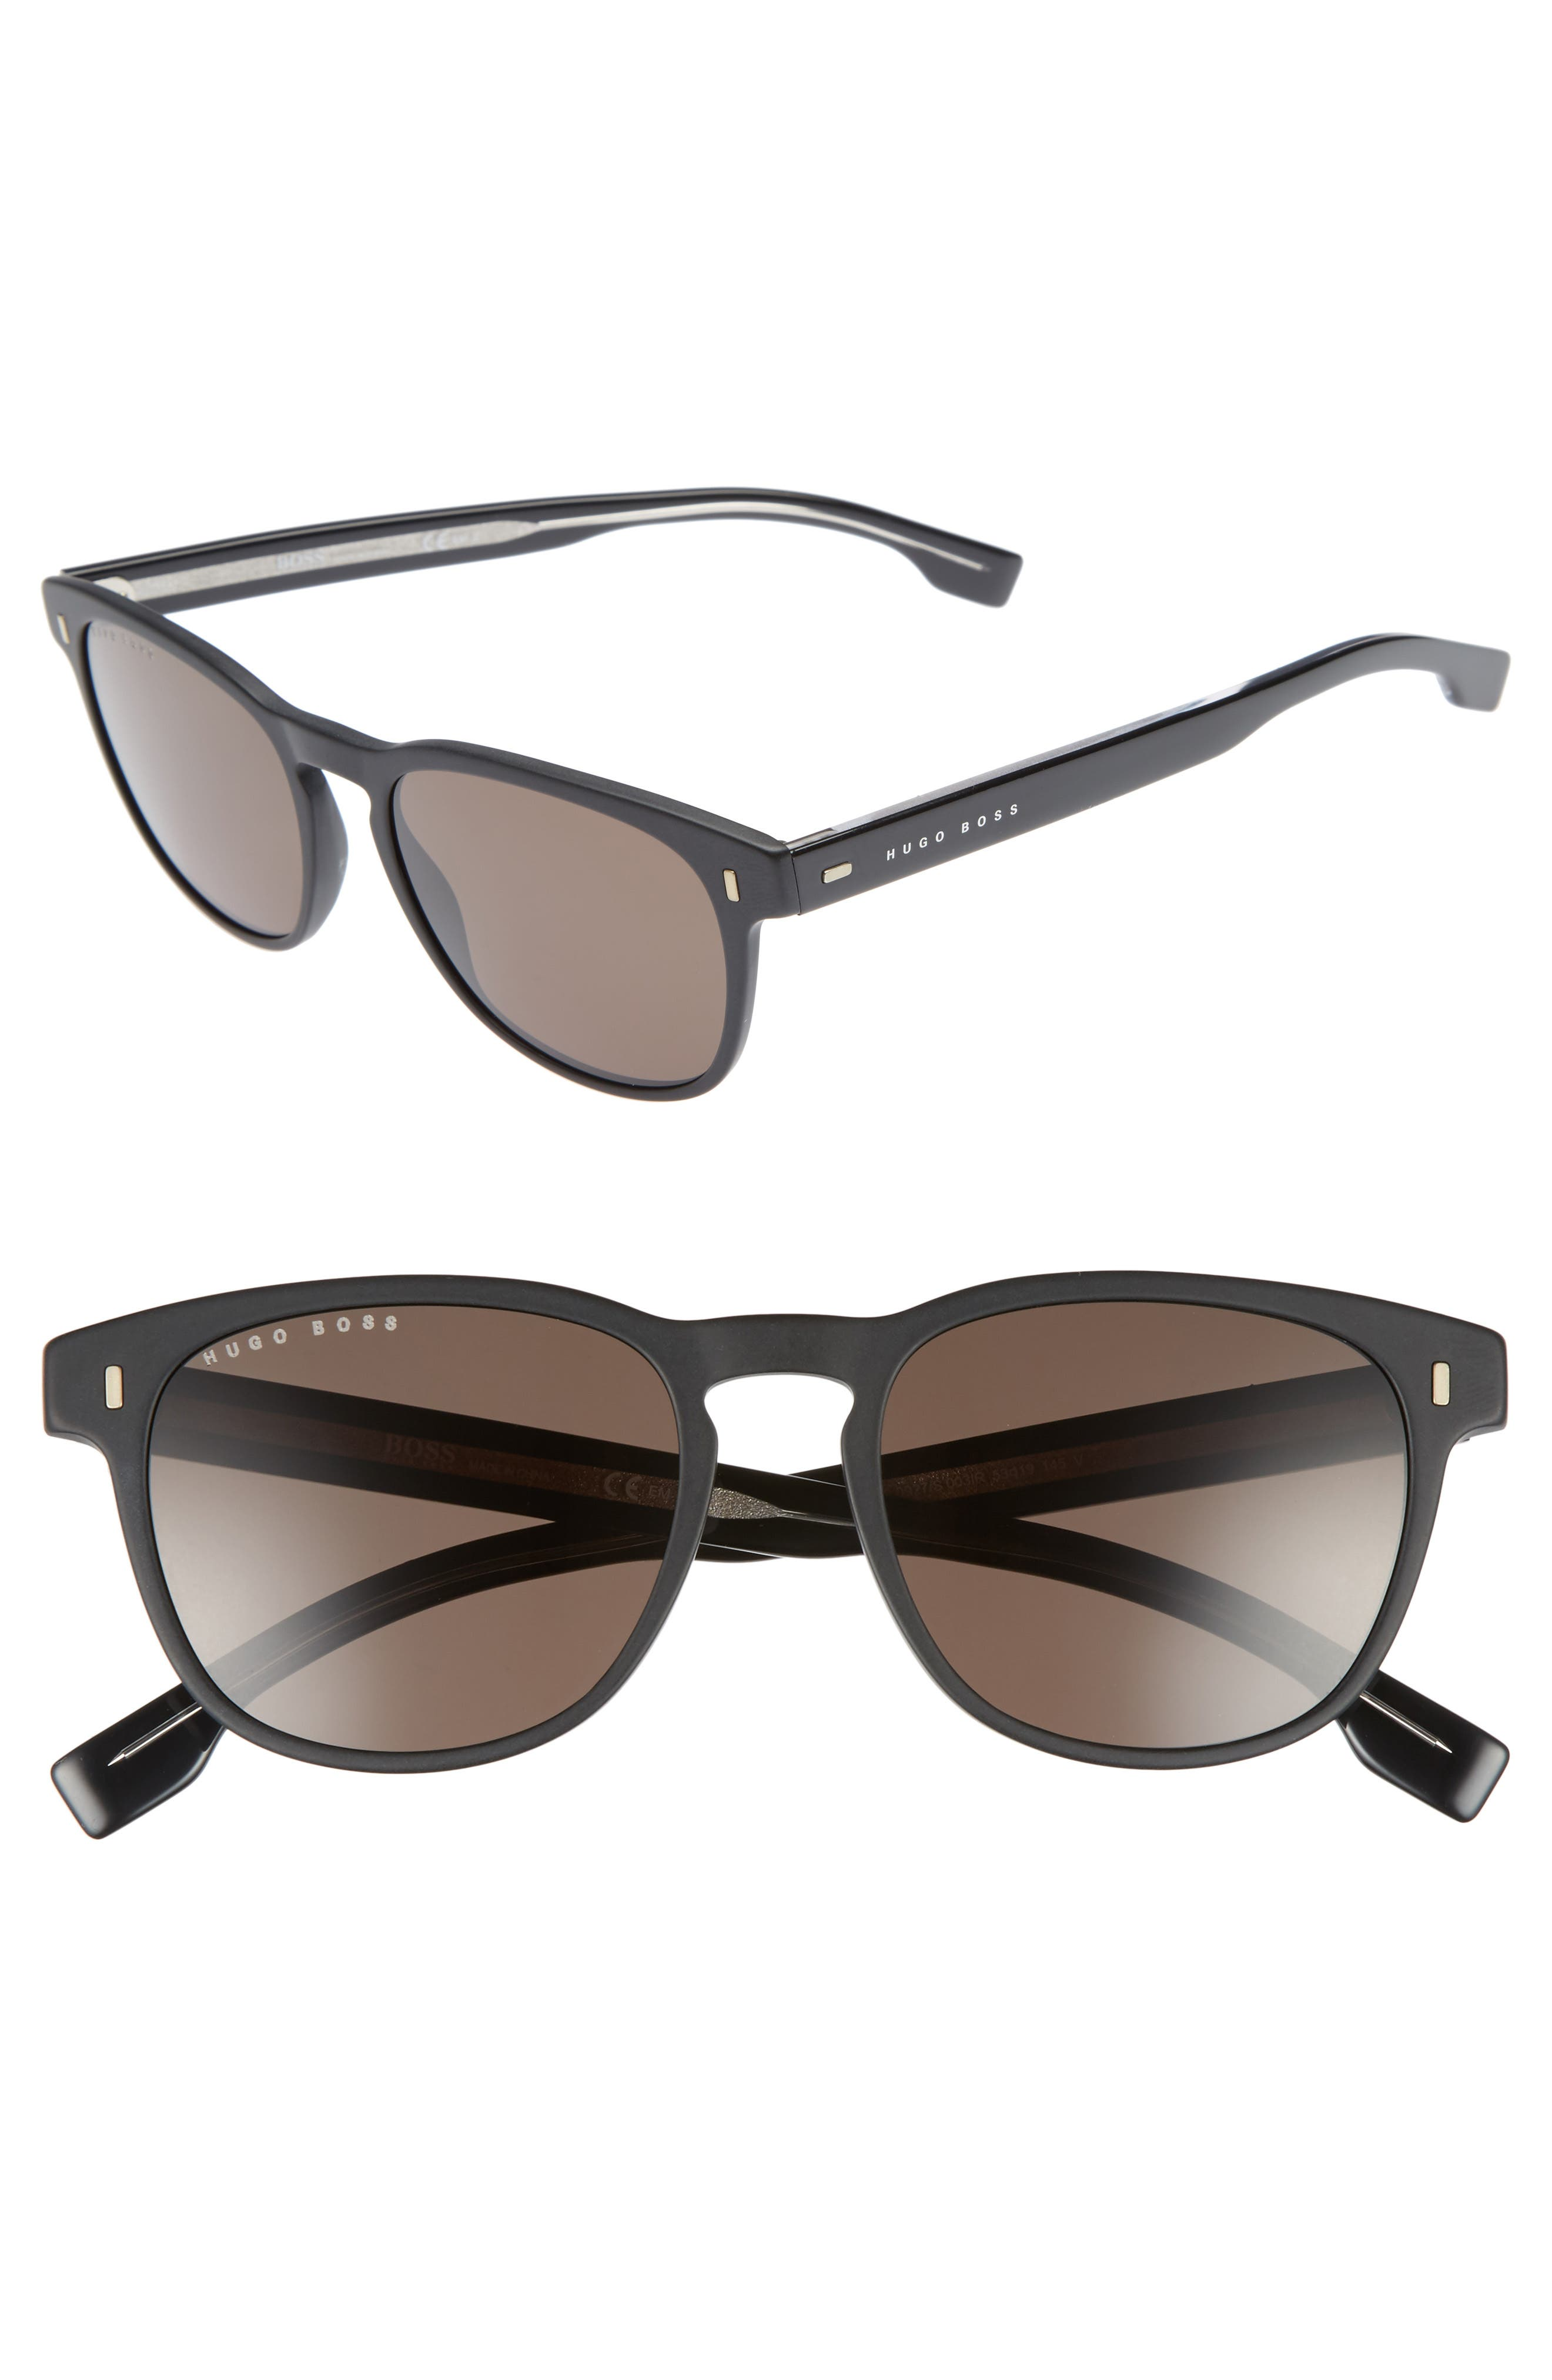 BOSS B0926S 49mm Polarized Sunglasses, Main, color, 001